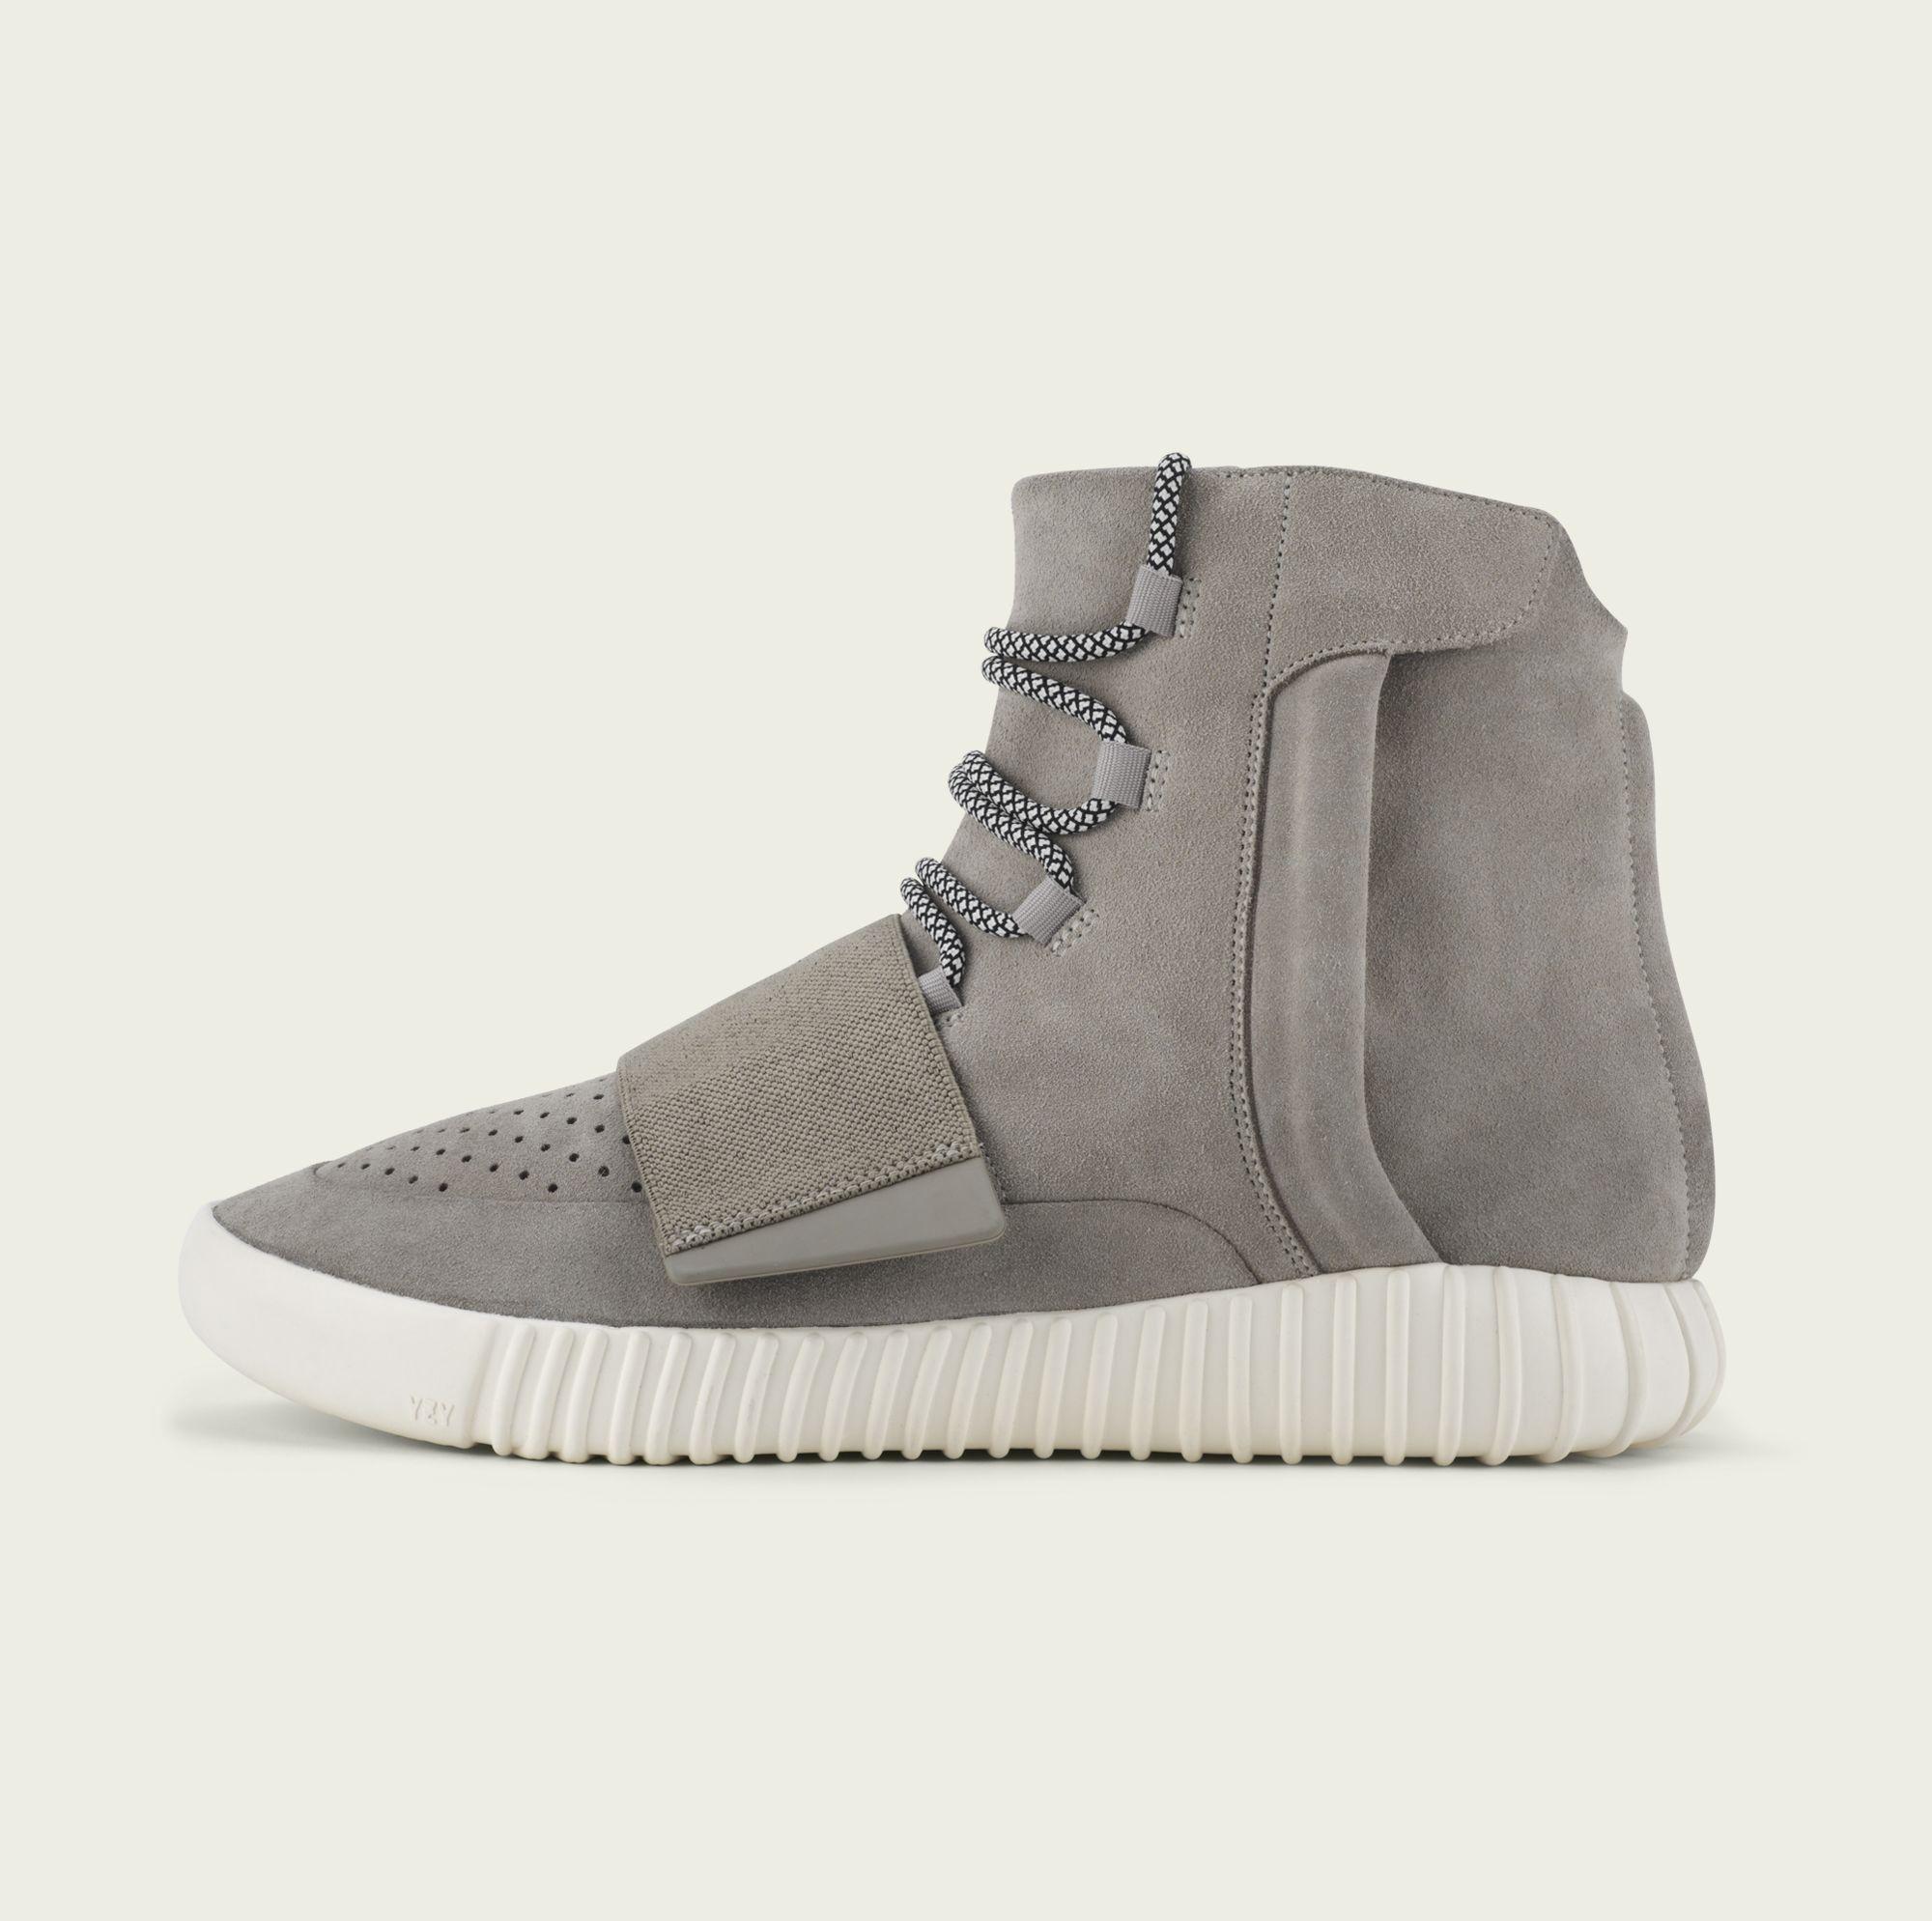 adidas yeezy impulso schoenen scarpe pinterest yeezy impulso